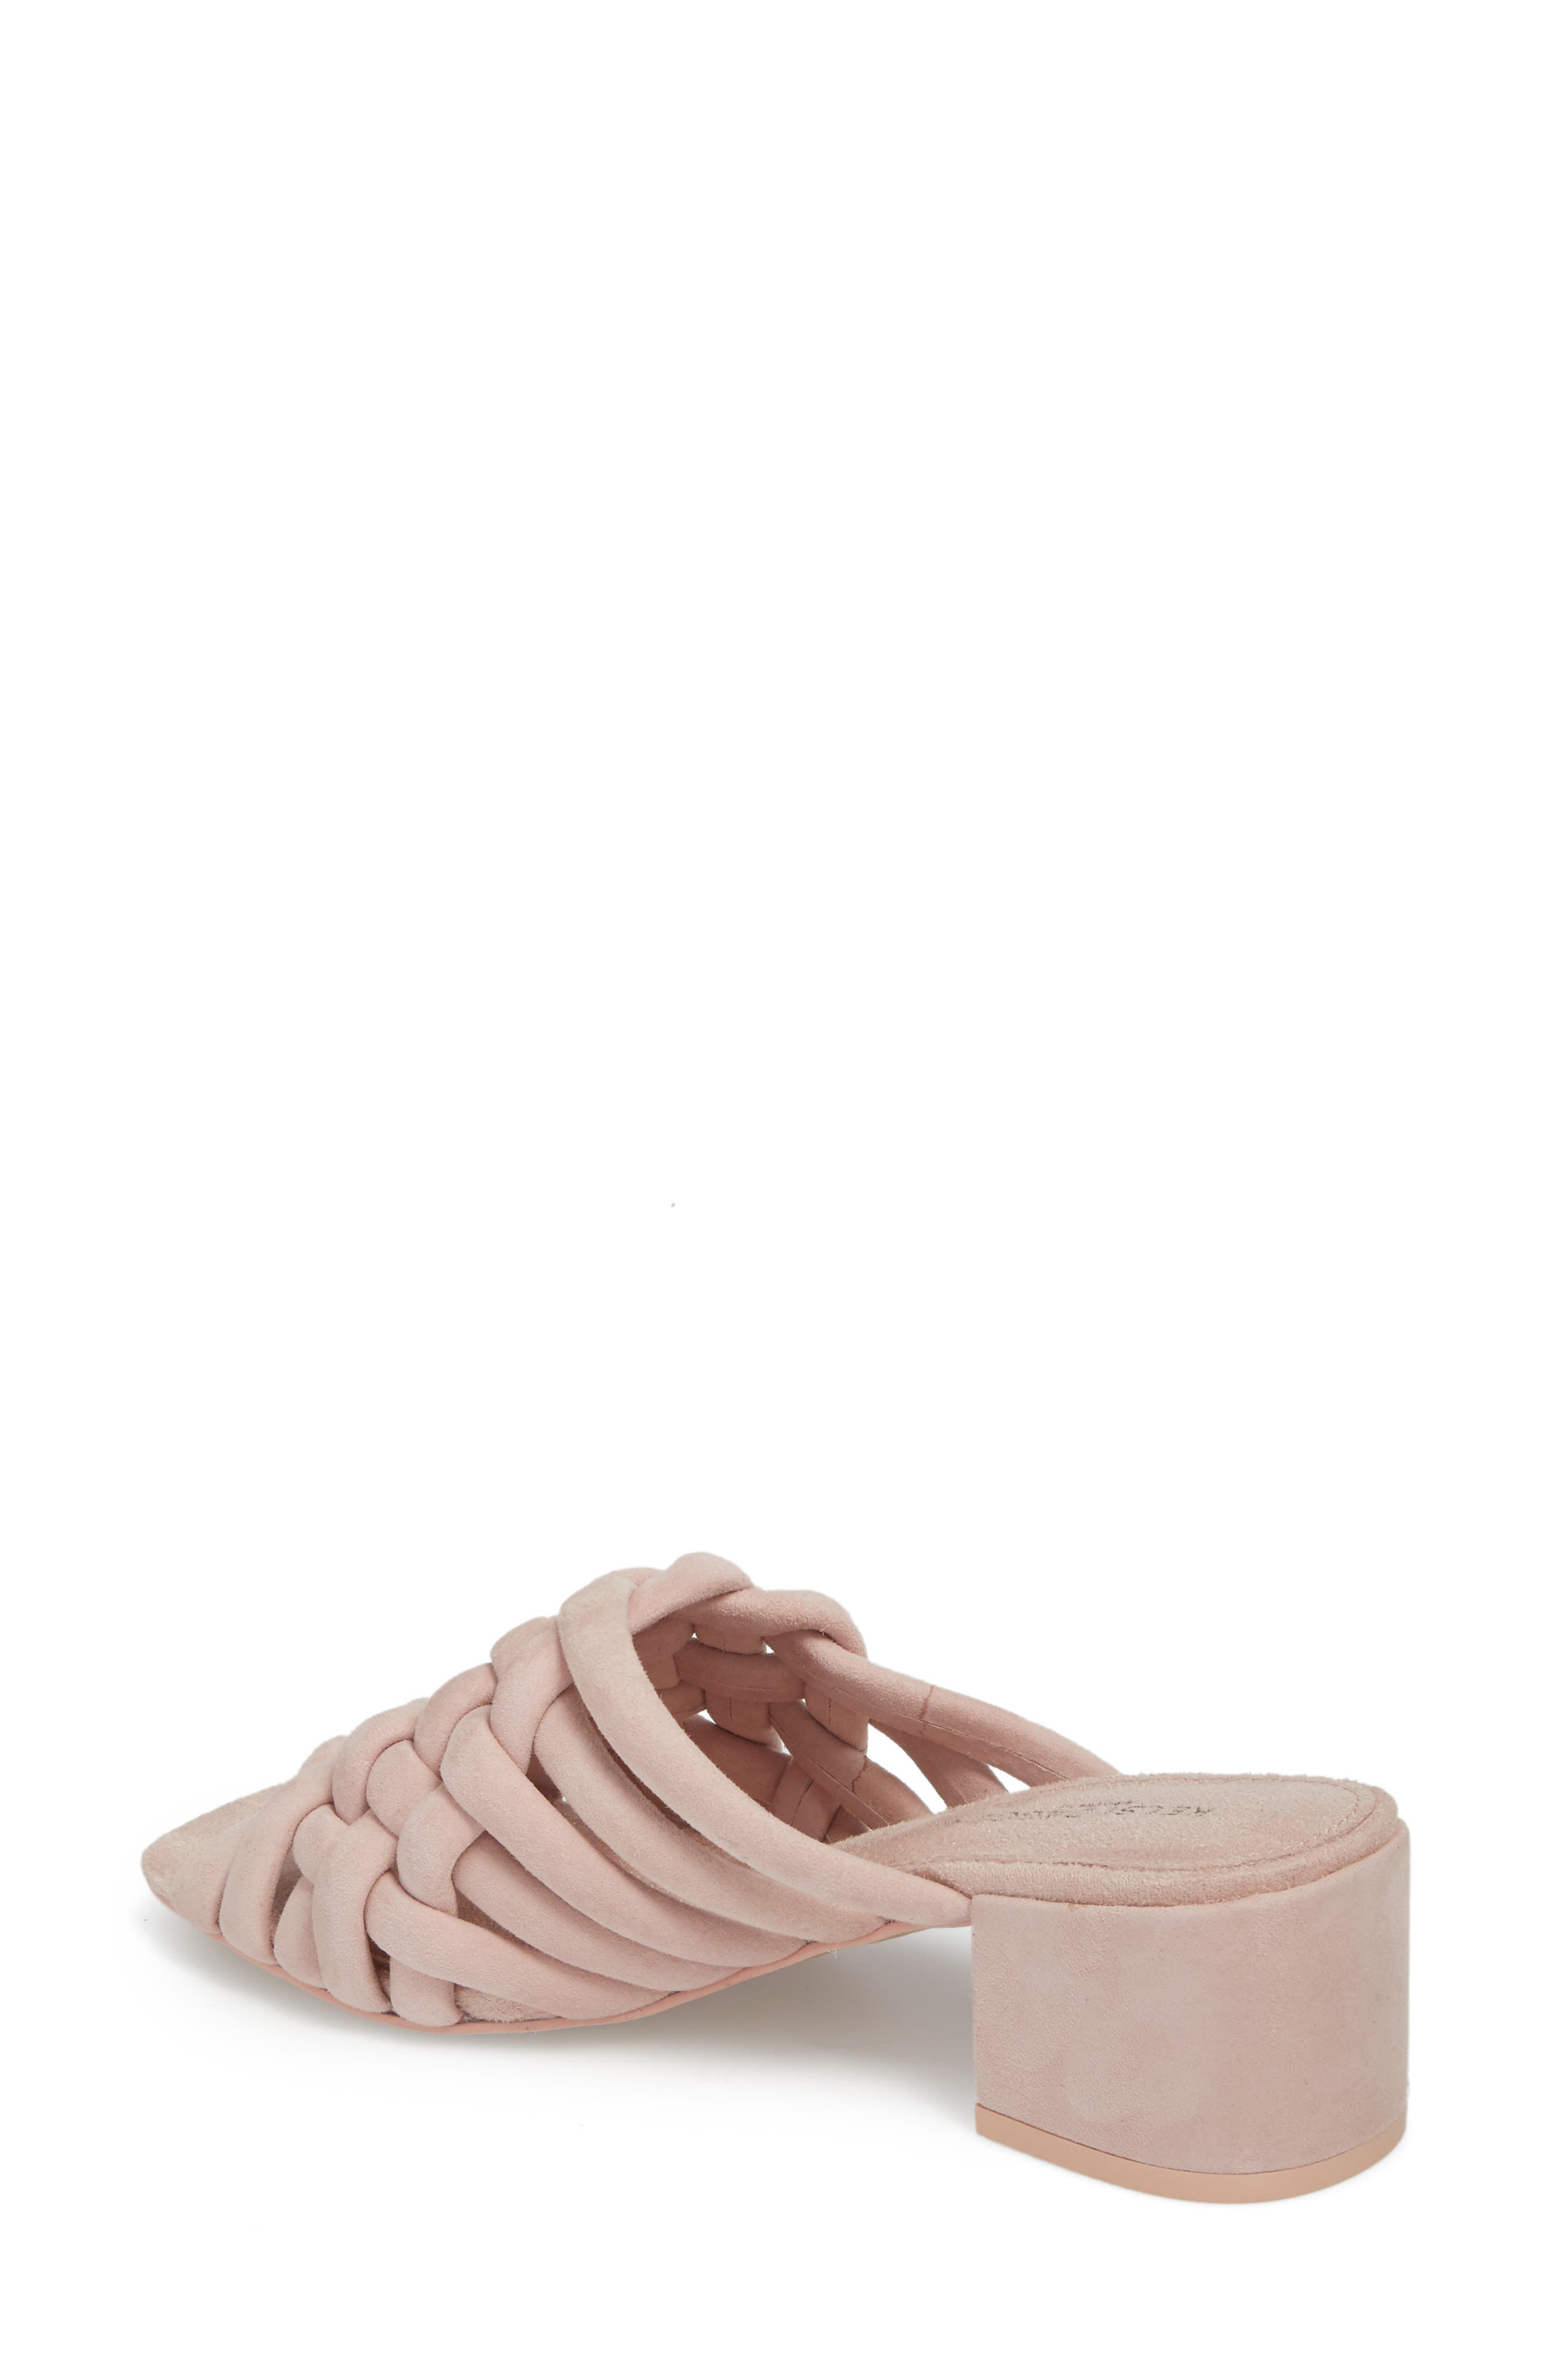 Sky Dress Woven Mule Sandal,                             Alternate thumbnail 2, color,                             Pale Pink